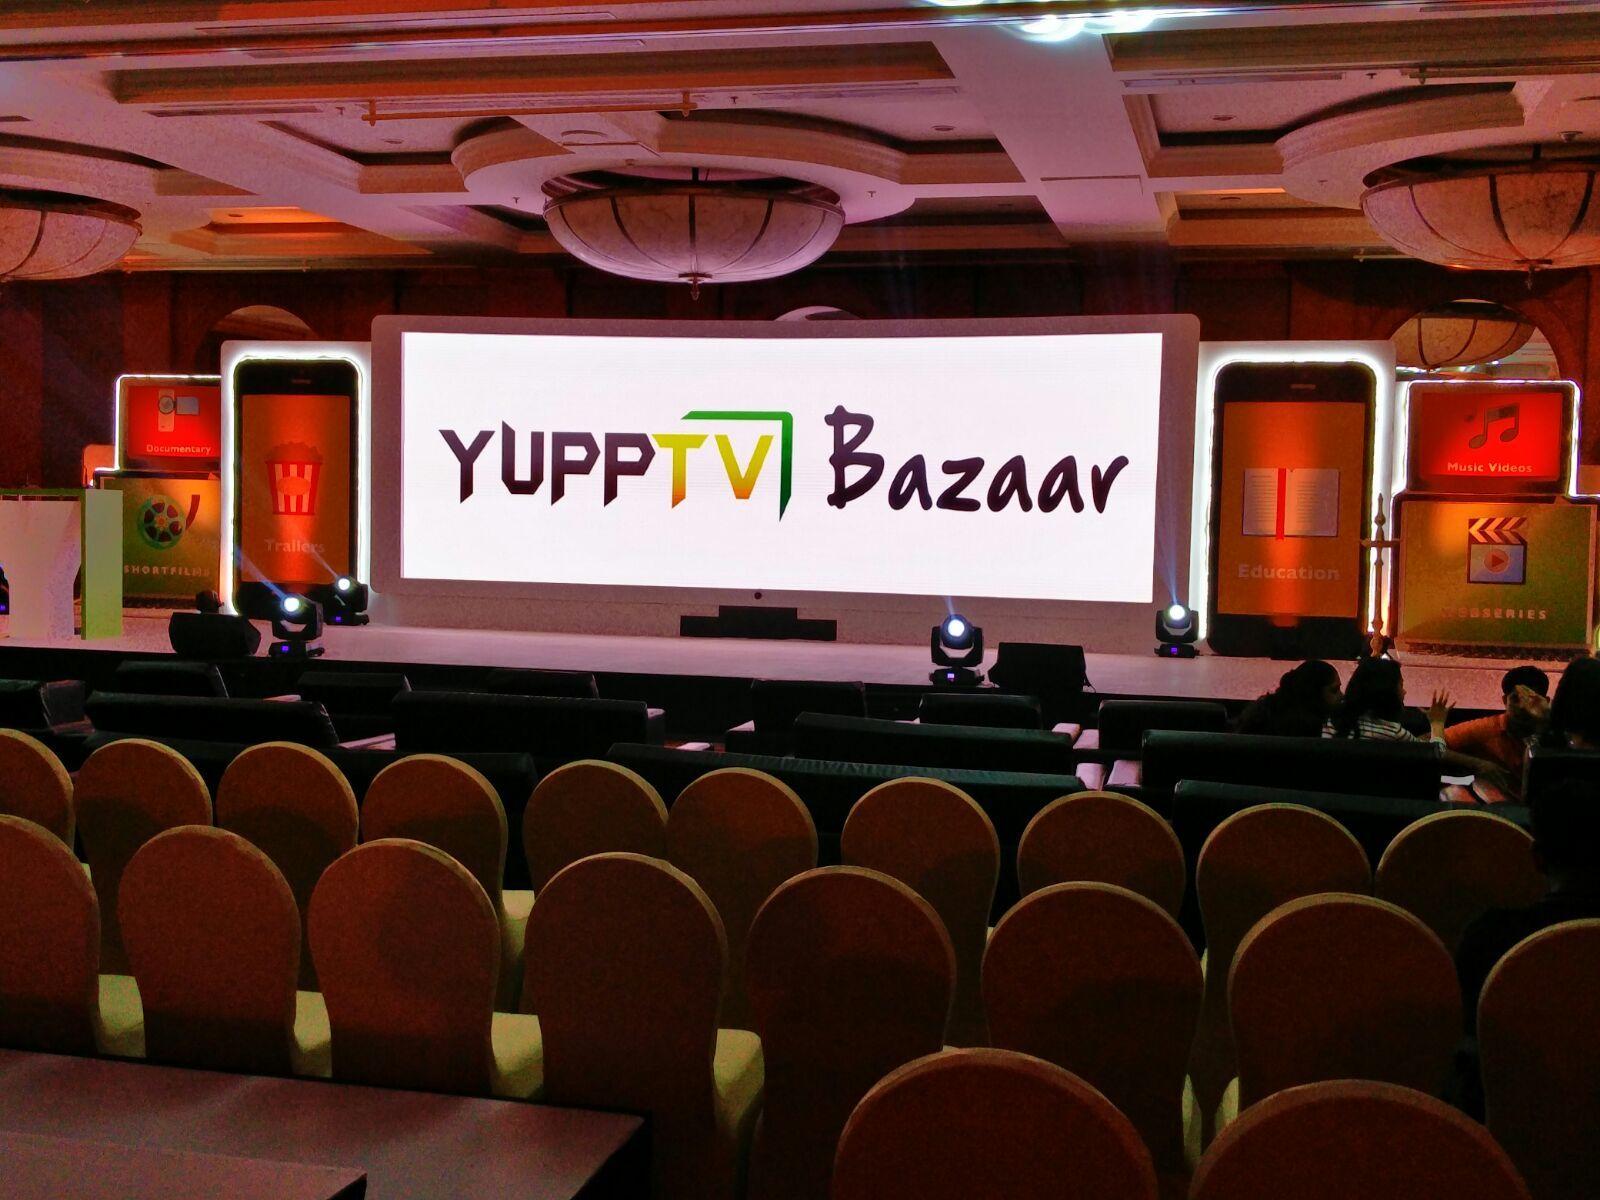 Yupptv bazaar launch